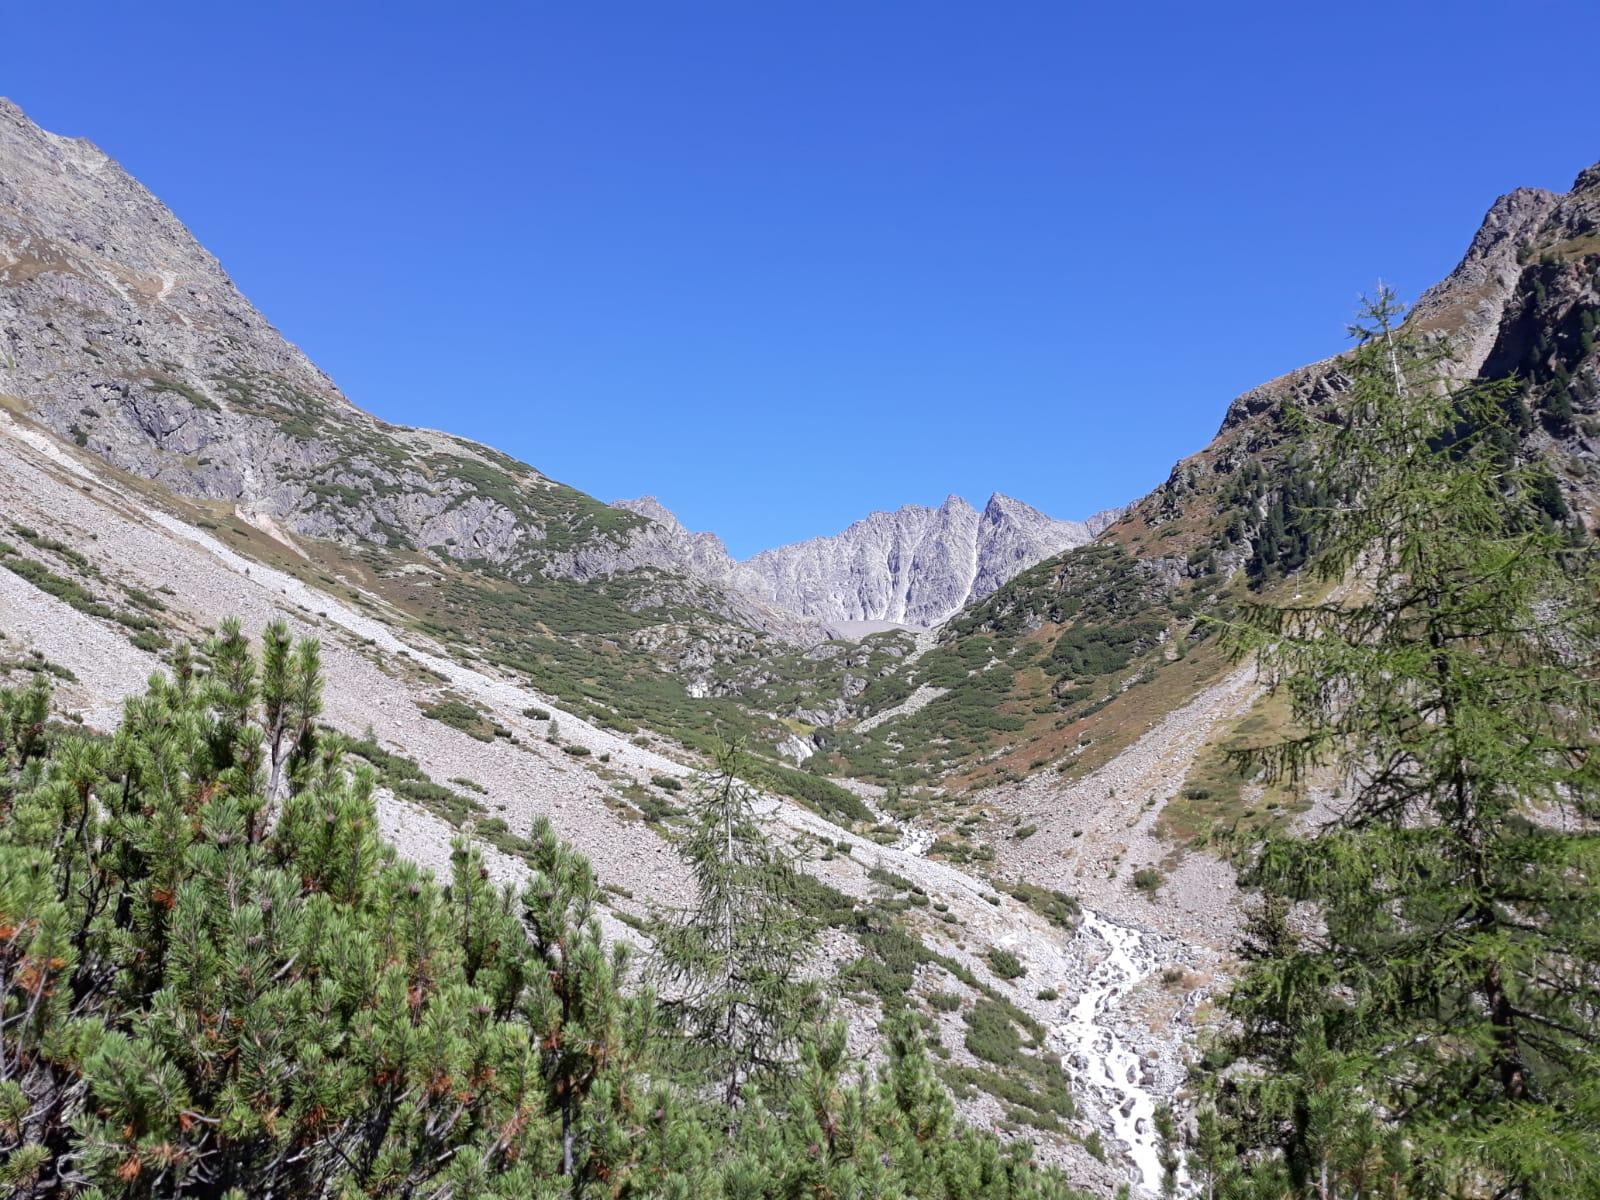 blauer Himmerl, Bäume, Berge.jpg